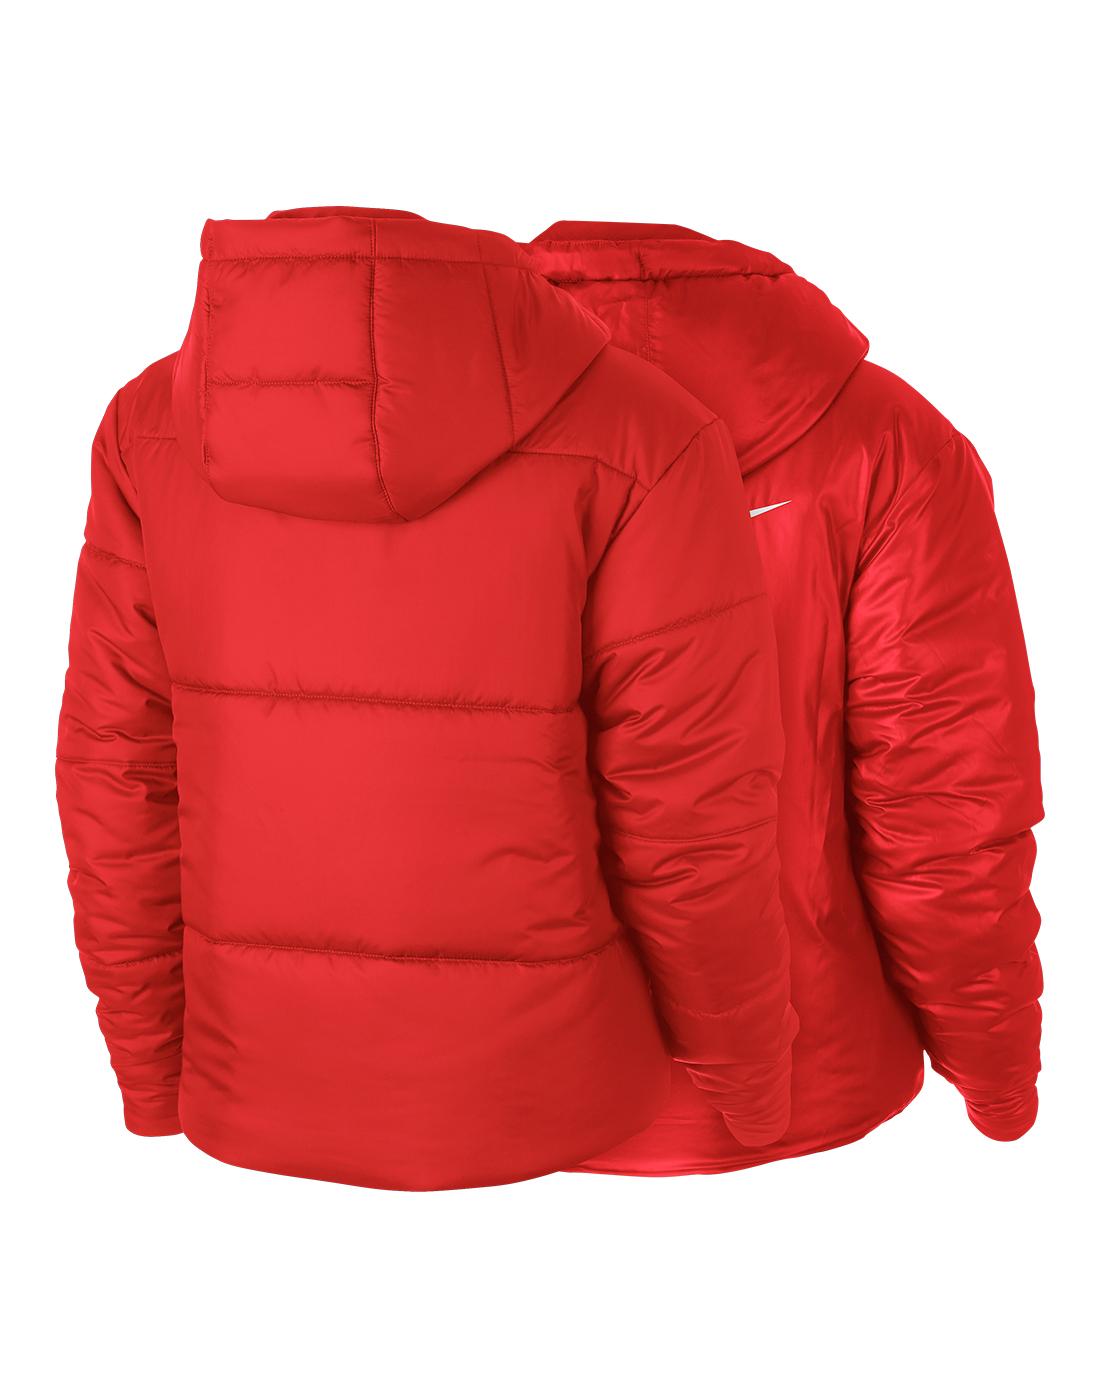 Womens Padded Reversible Jacket · Womens Padded Reversible Jacket ... fc2304e0c